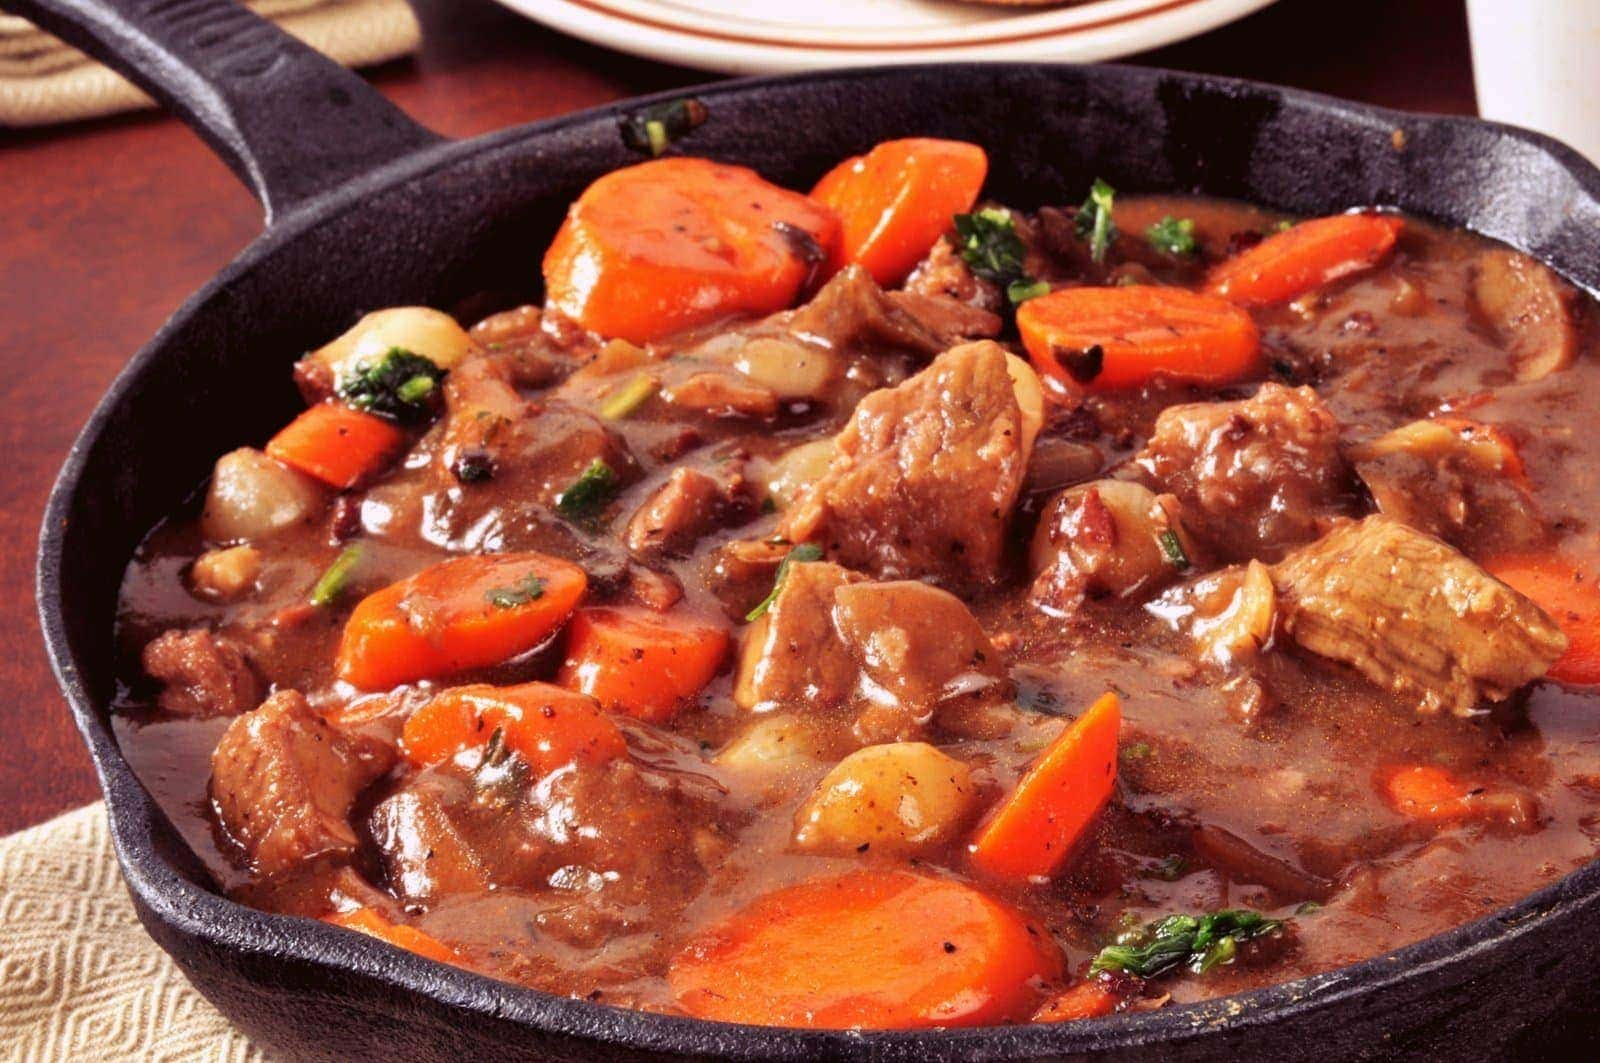 Boeuf bourguignon beef burgundy recipes